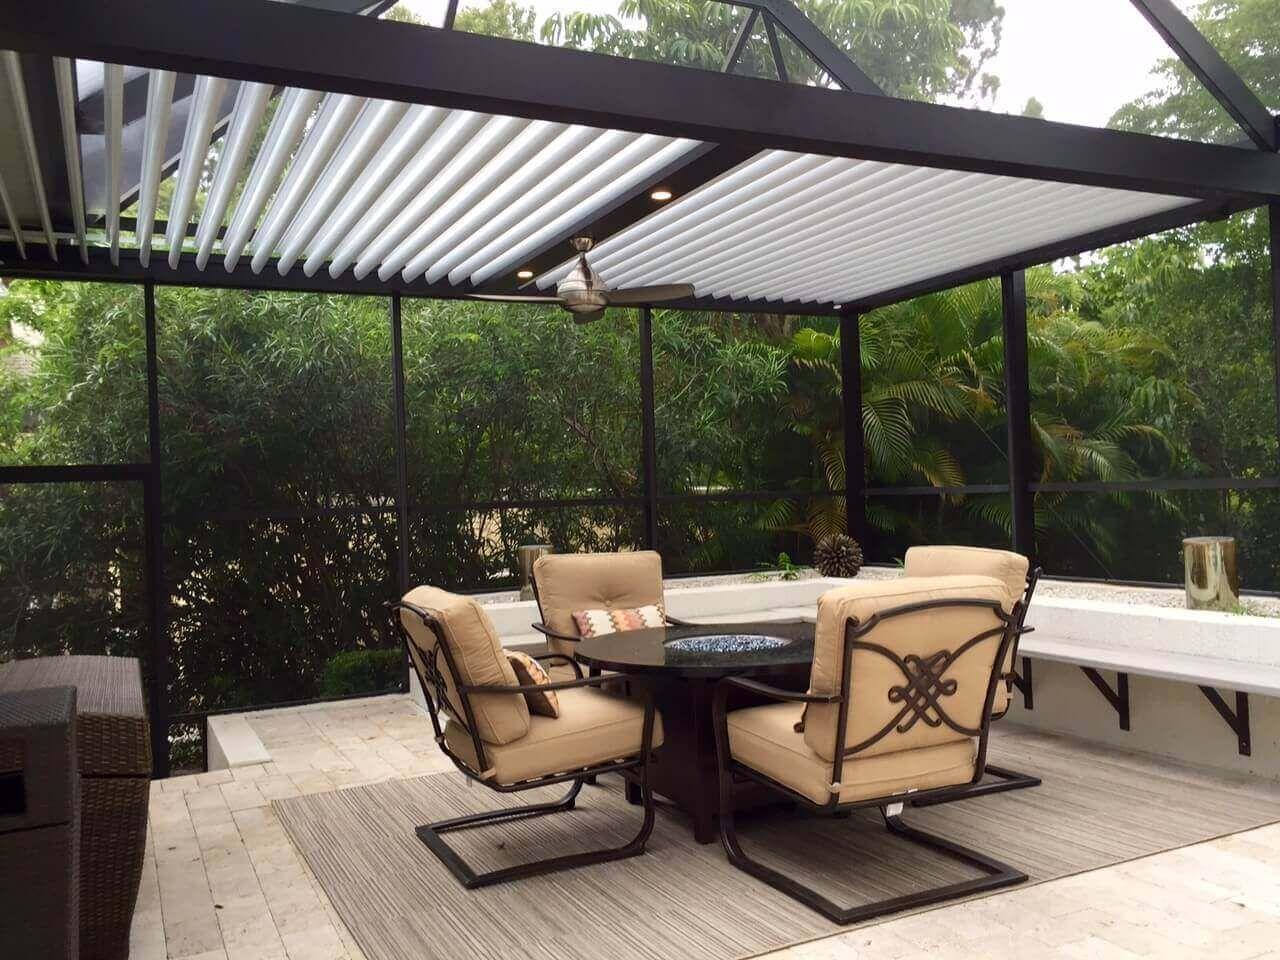 Adjustable Louvered Roof Patio gazebo, Aluminum pergola